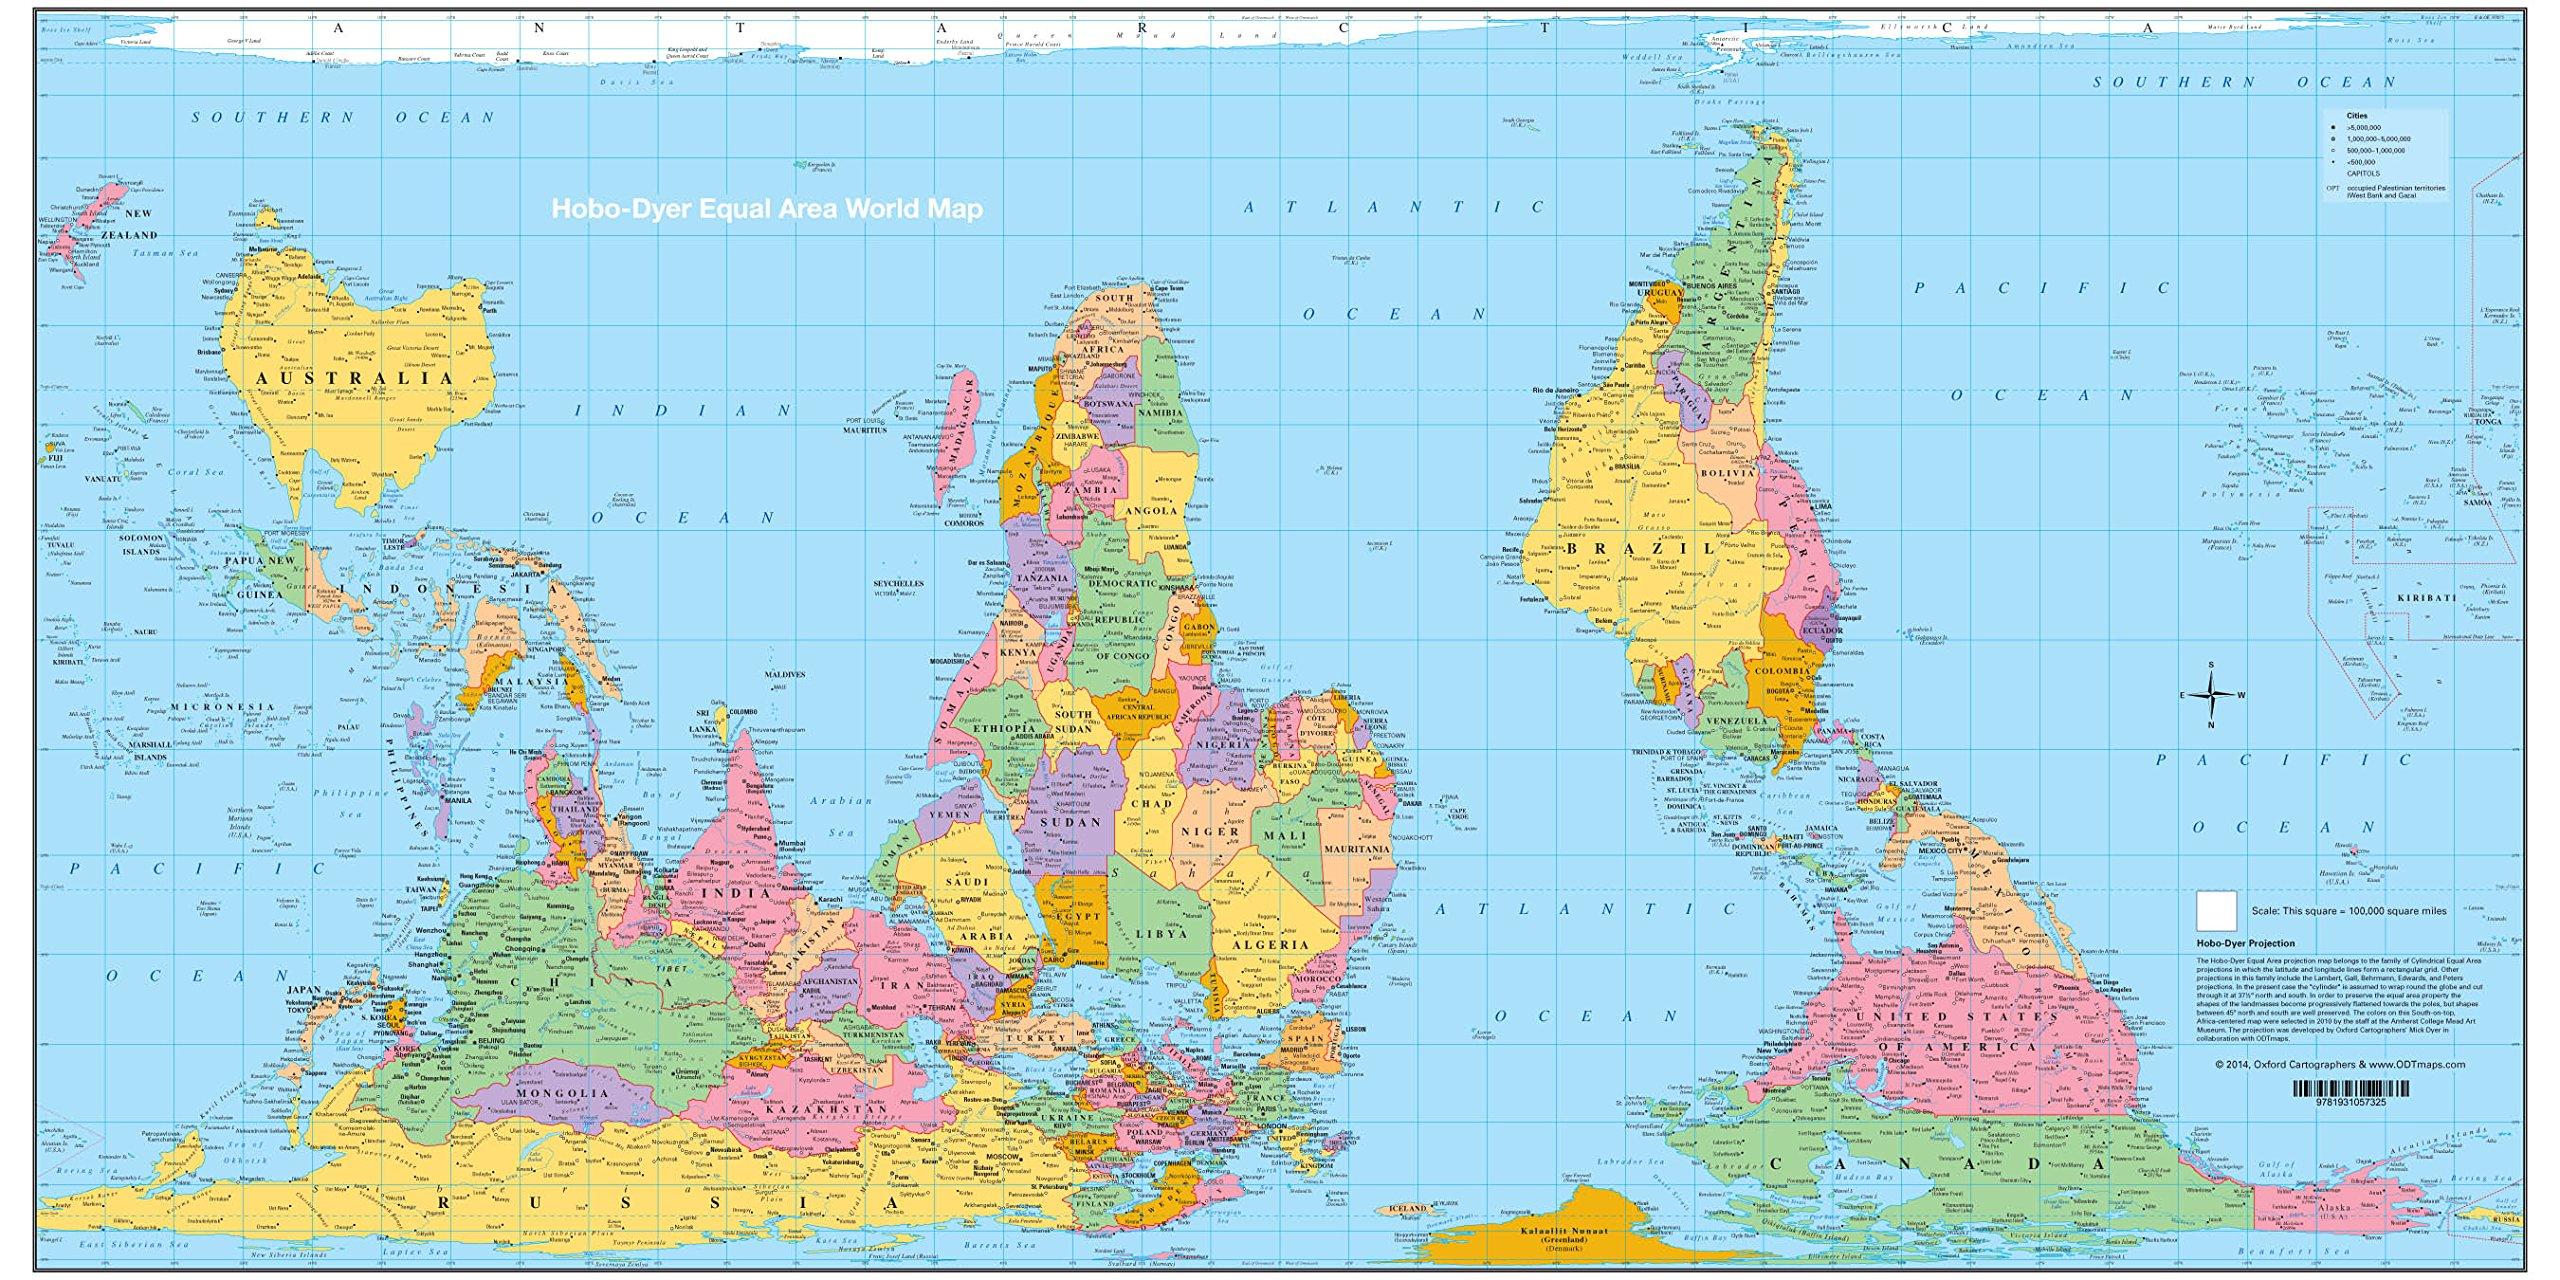 Hobo Dyer Map: Amazon.de: Fremdsprachige Bücher